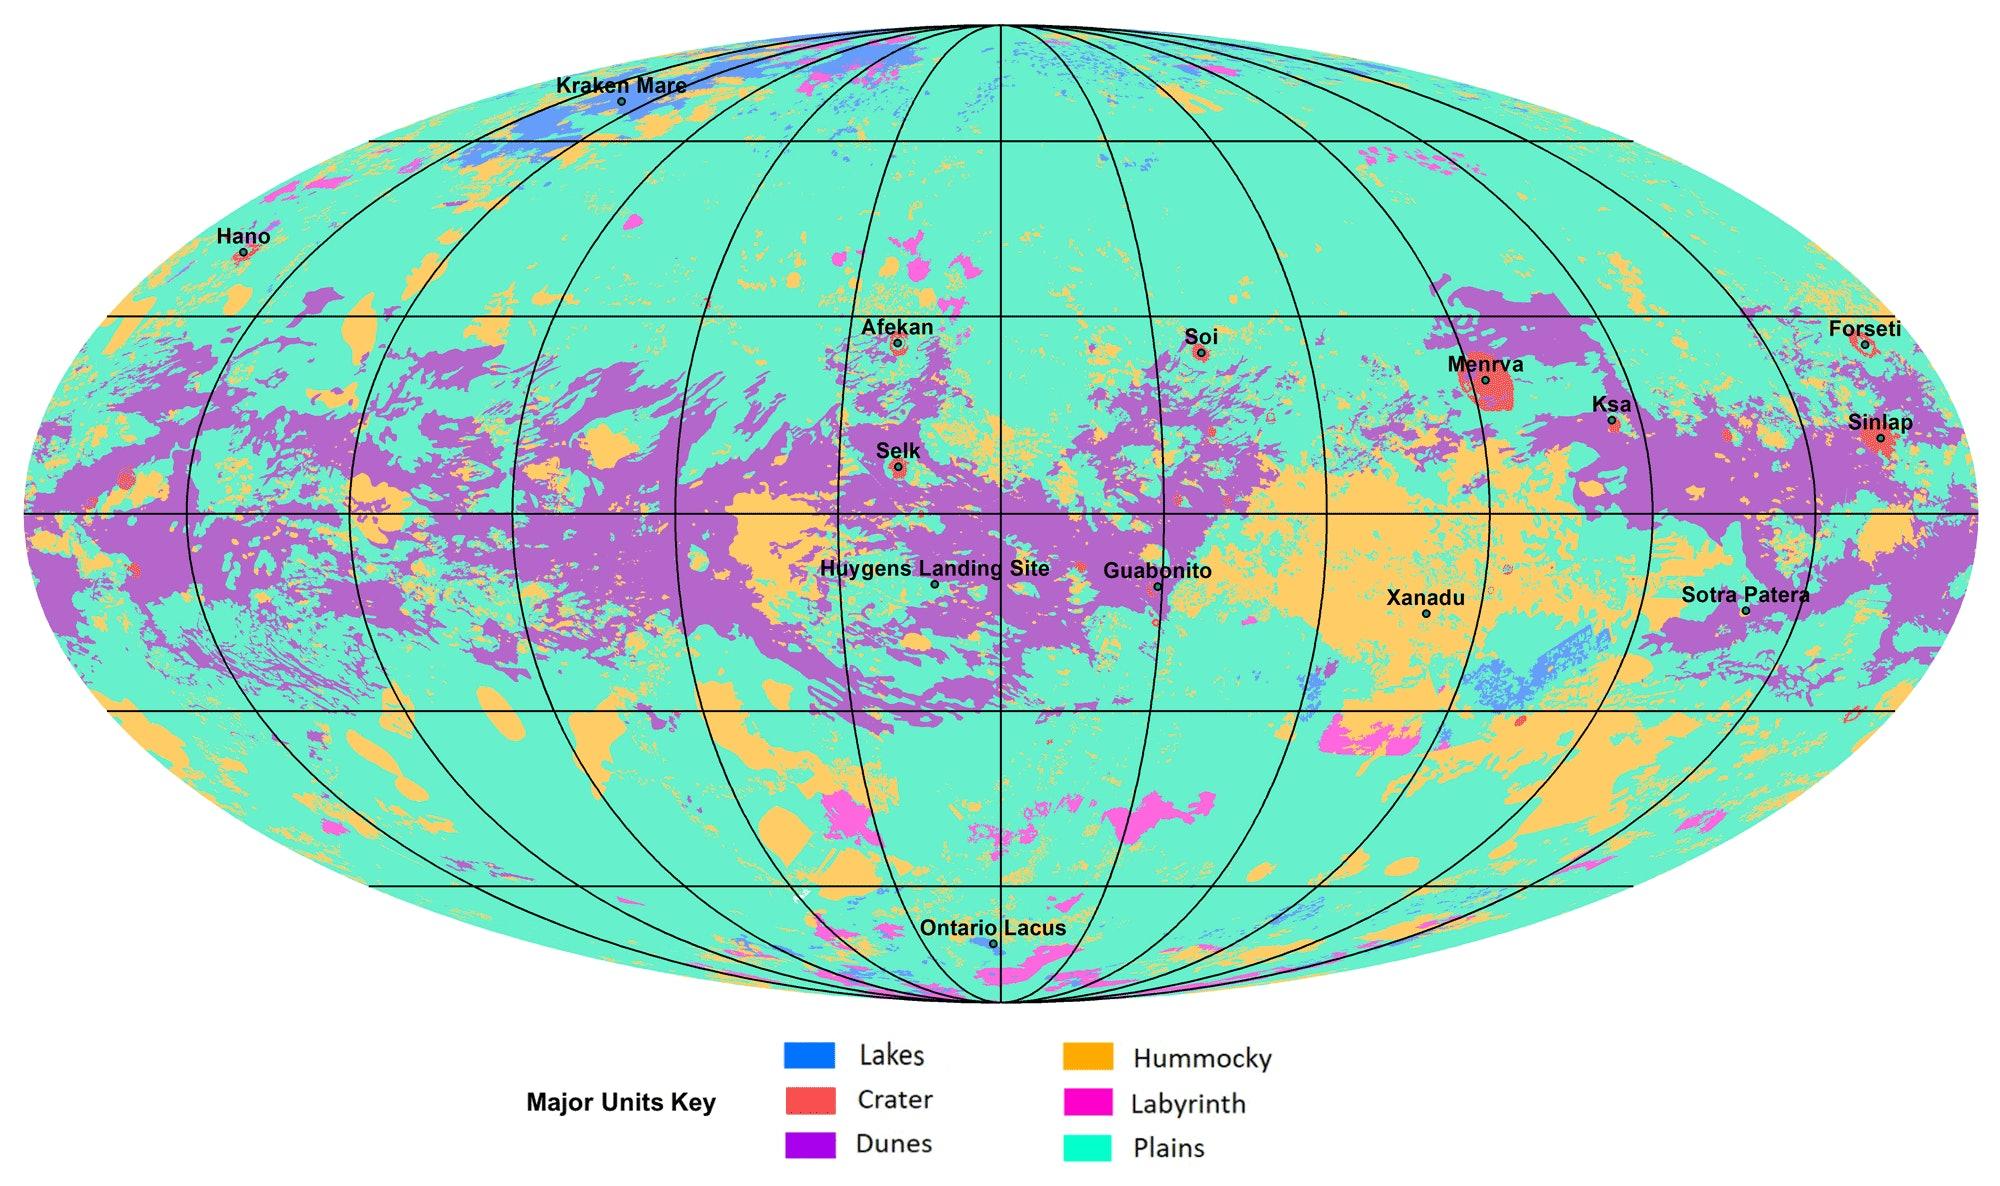 Titan geological map